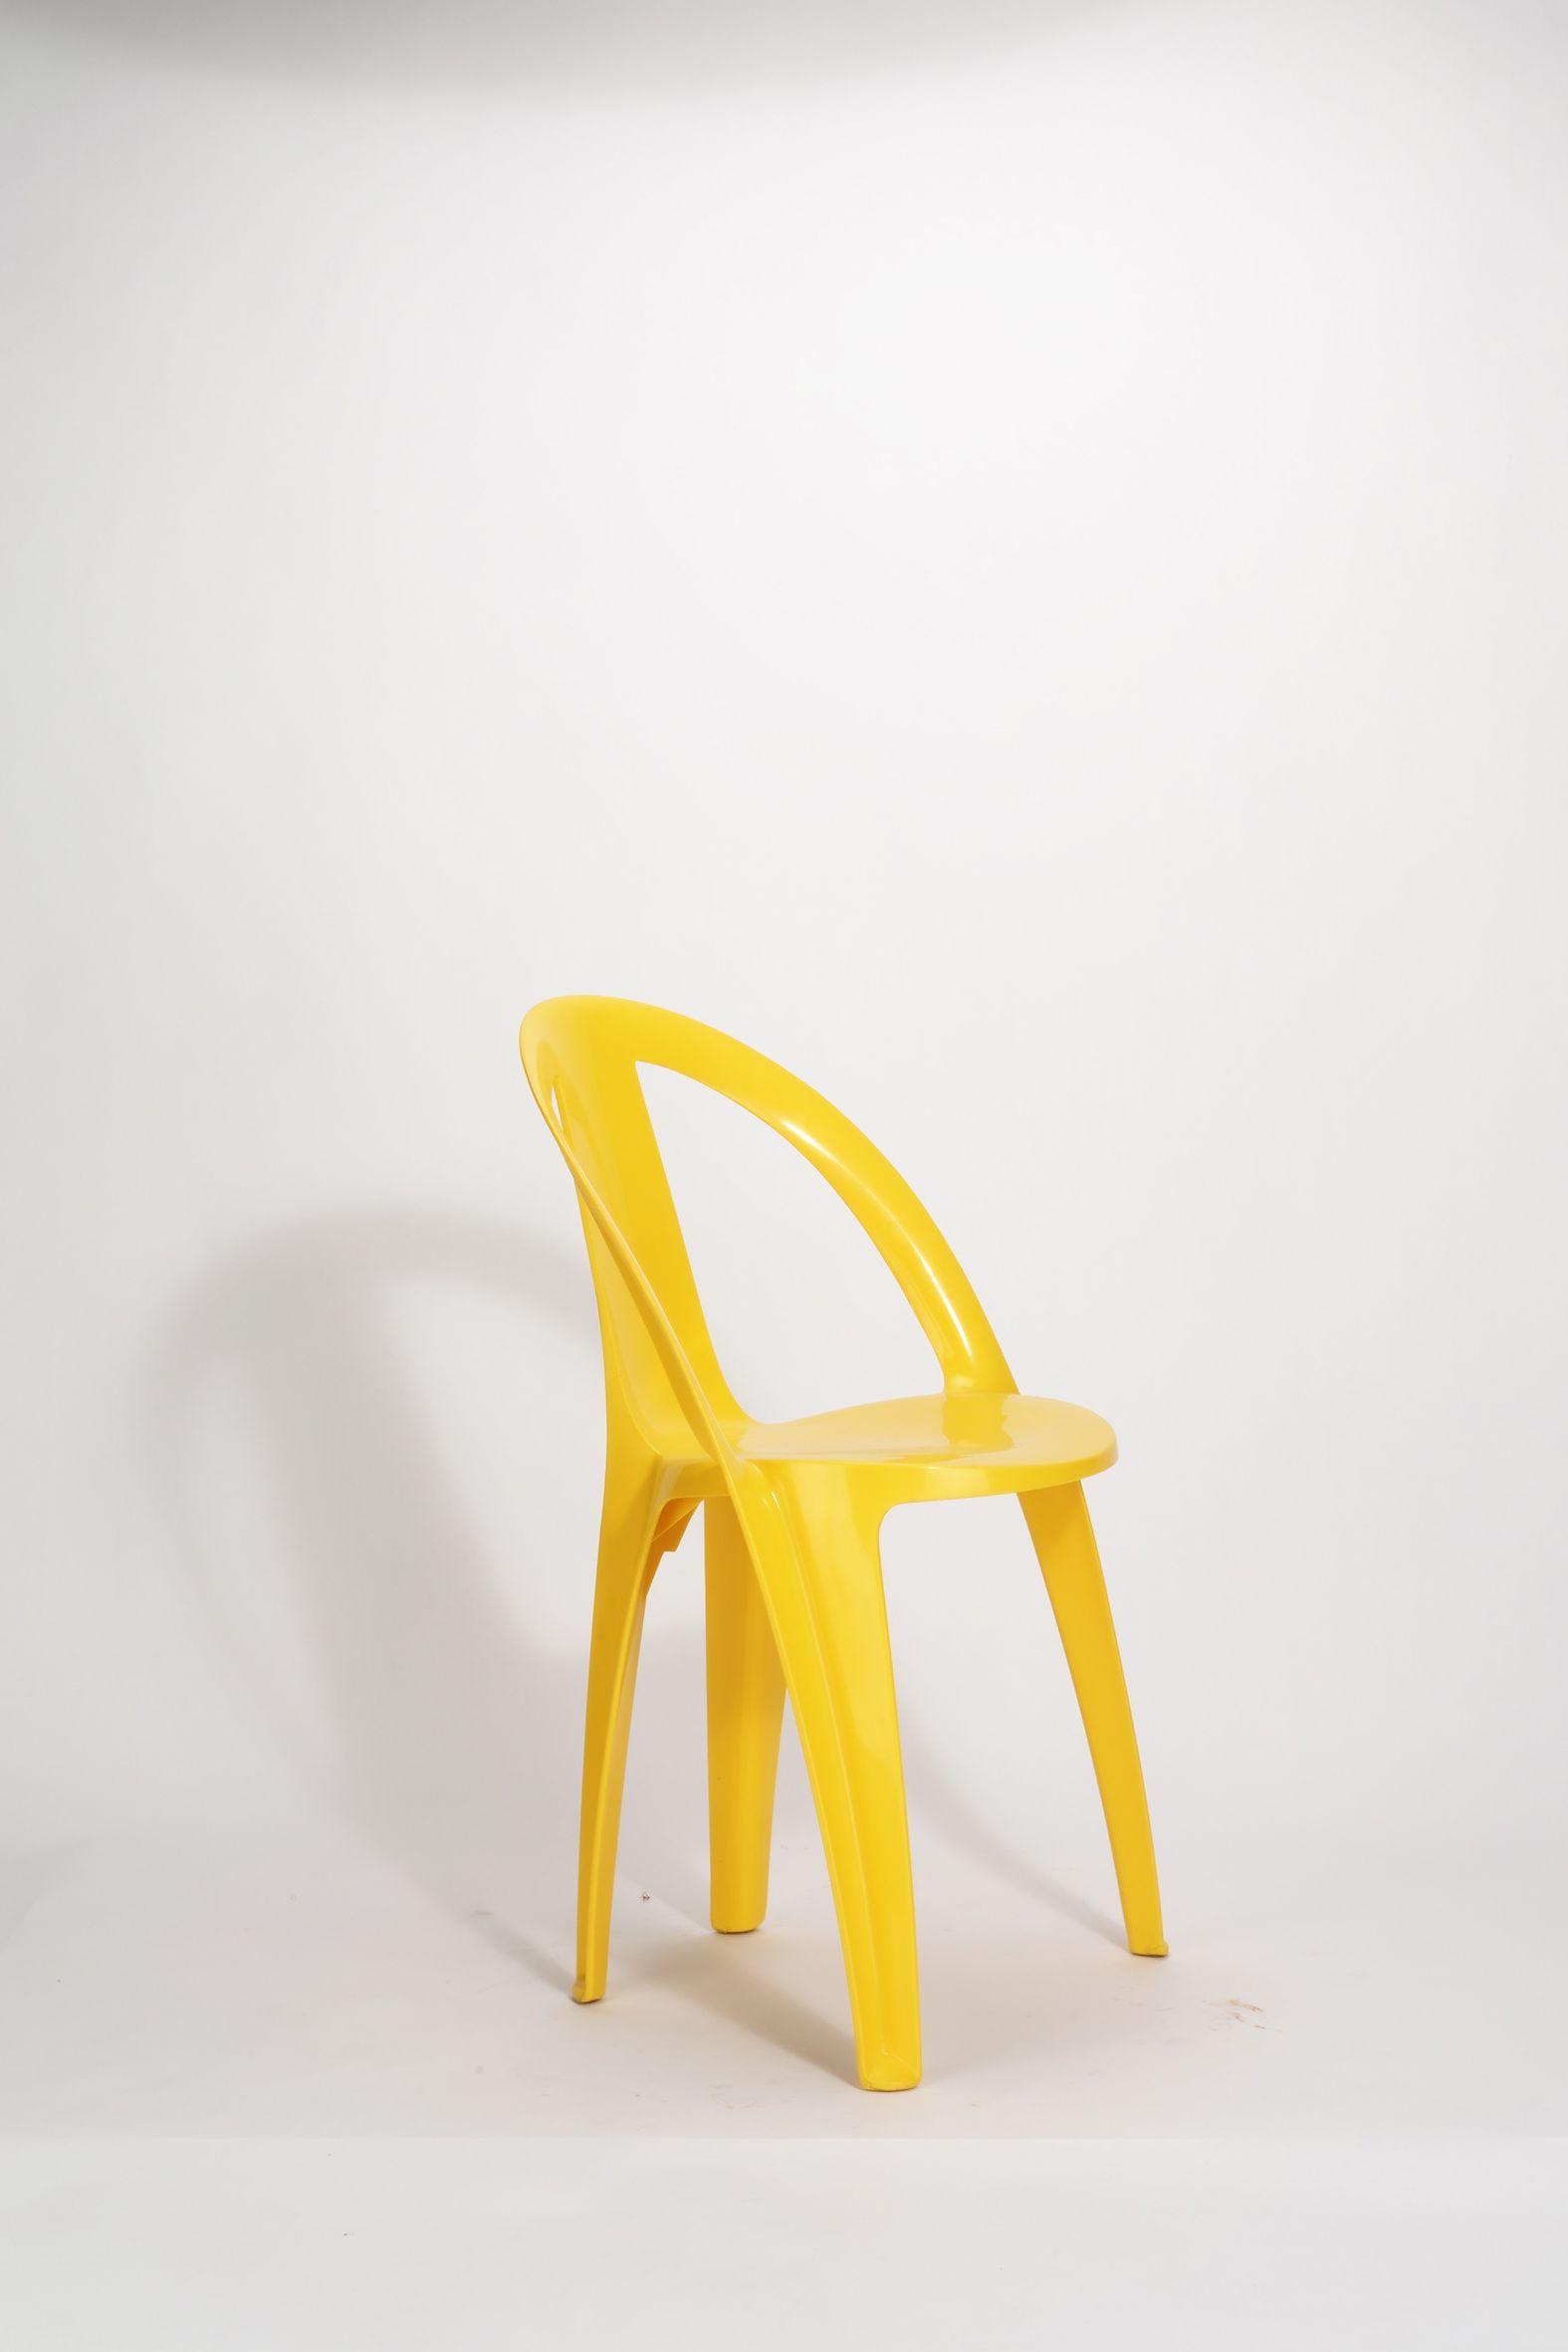 Sammlung Loffler Gmbh Stuhle Sammlung Design